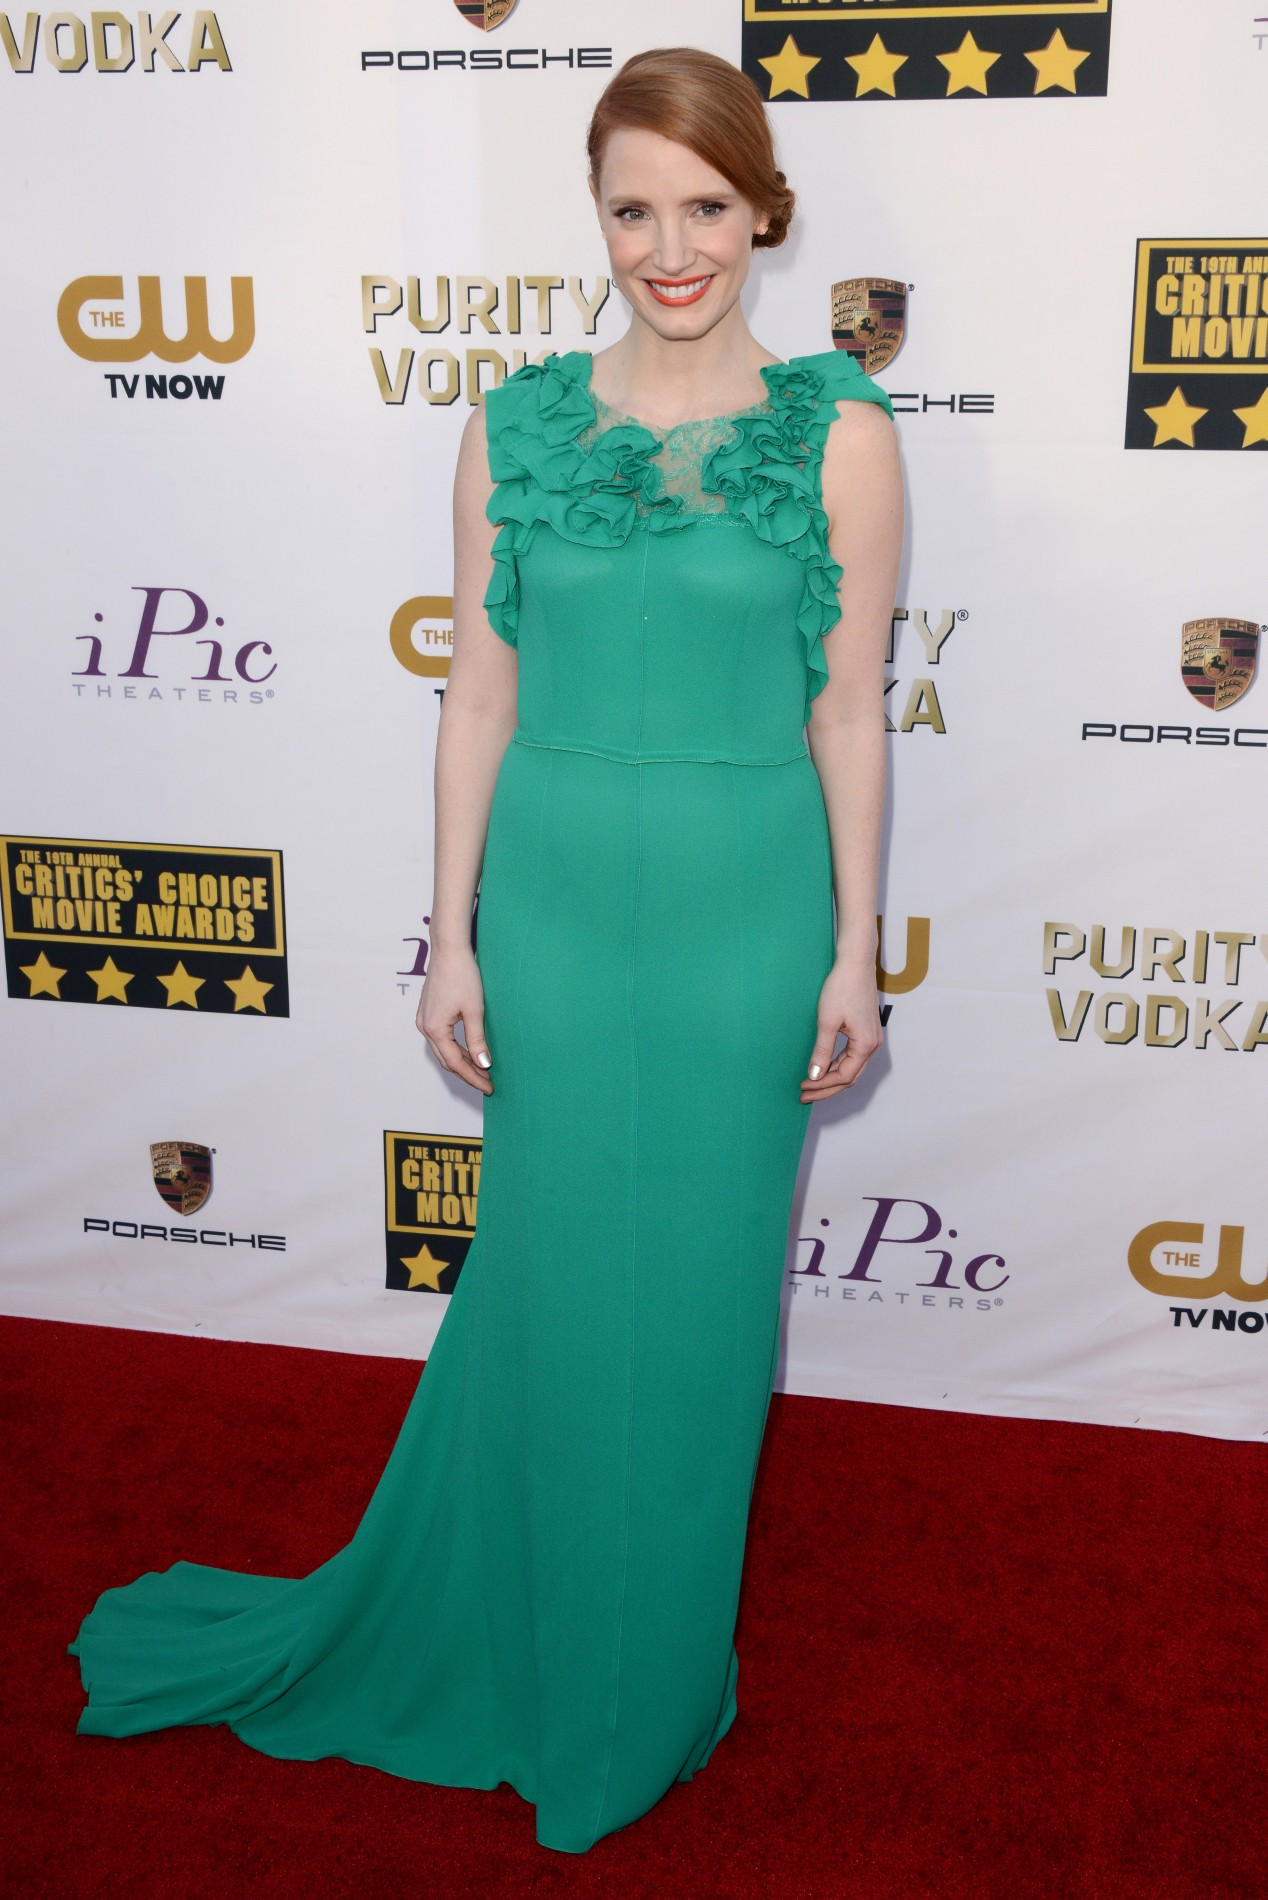 Vedetele @ 2014 Critics' Choice Movie Awards